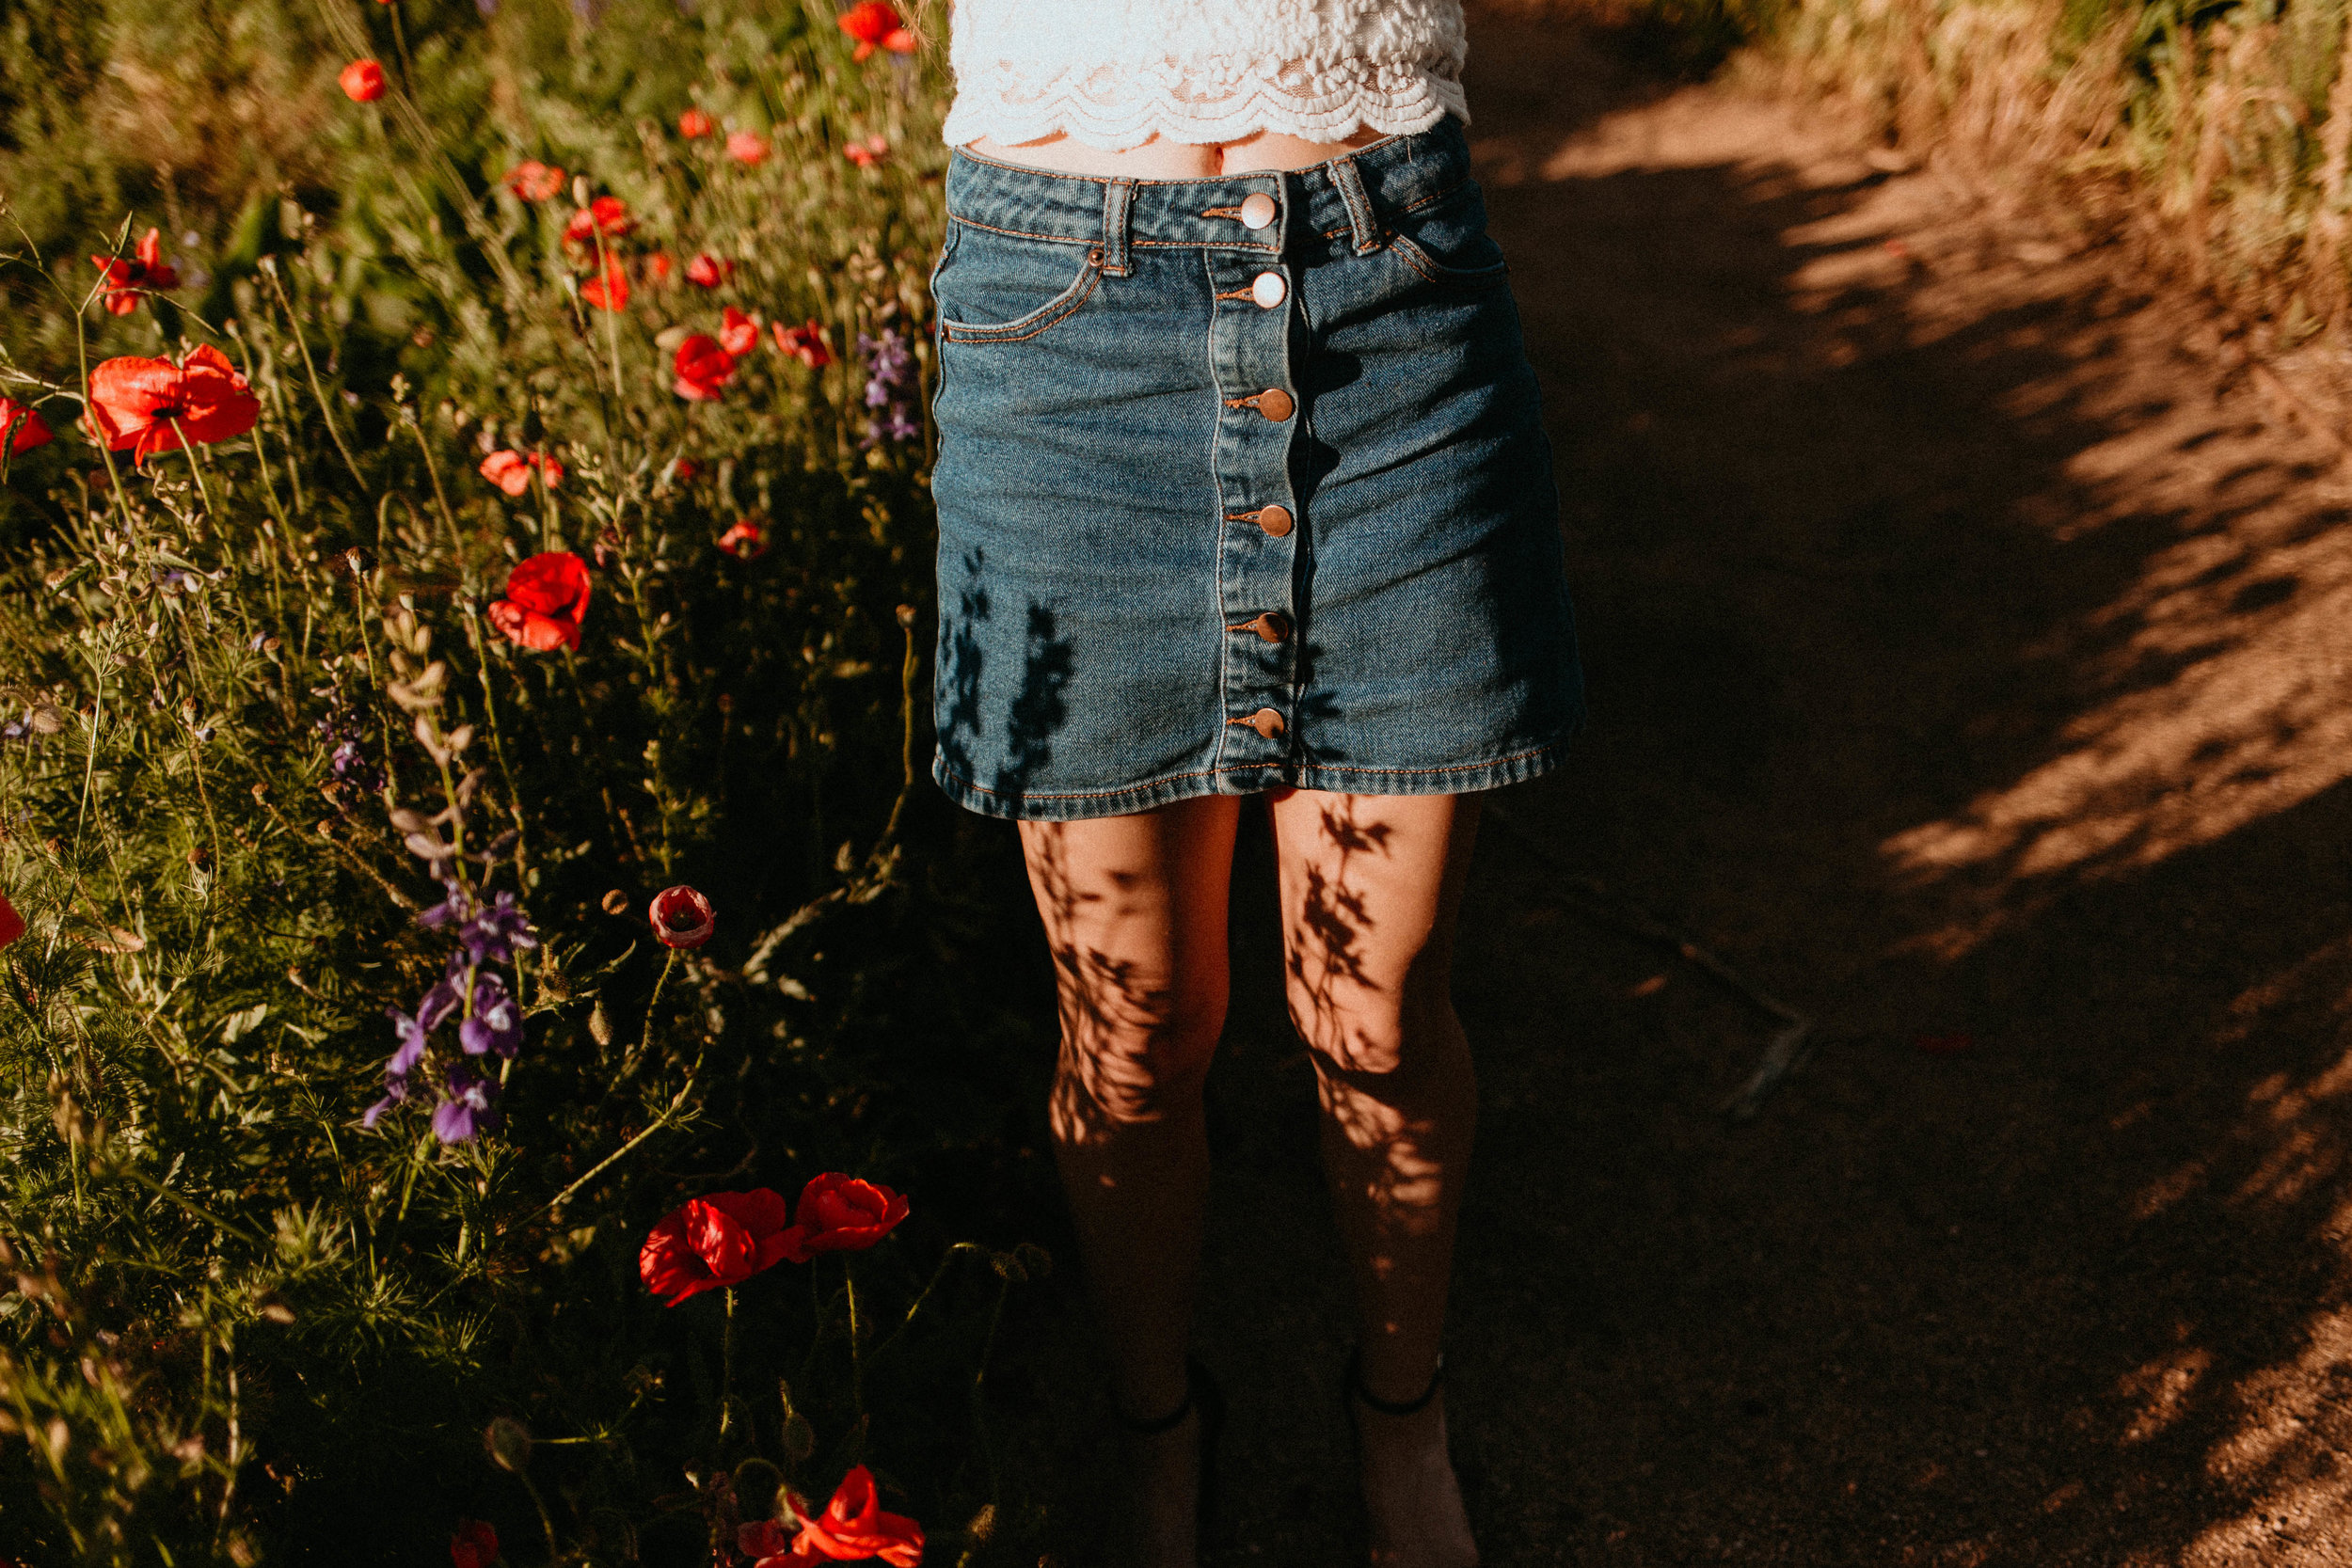 Best Graduation Photographer in Lubbock | Kailee Ann Photography | Lubbock TX Photographer